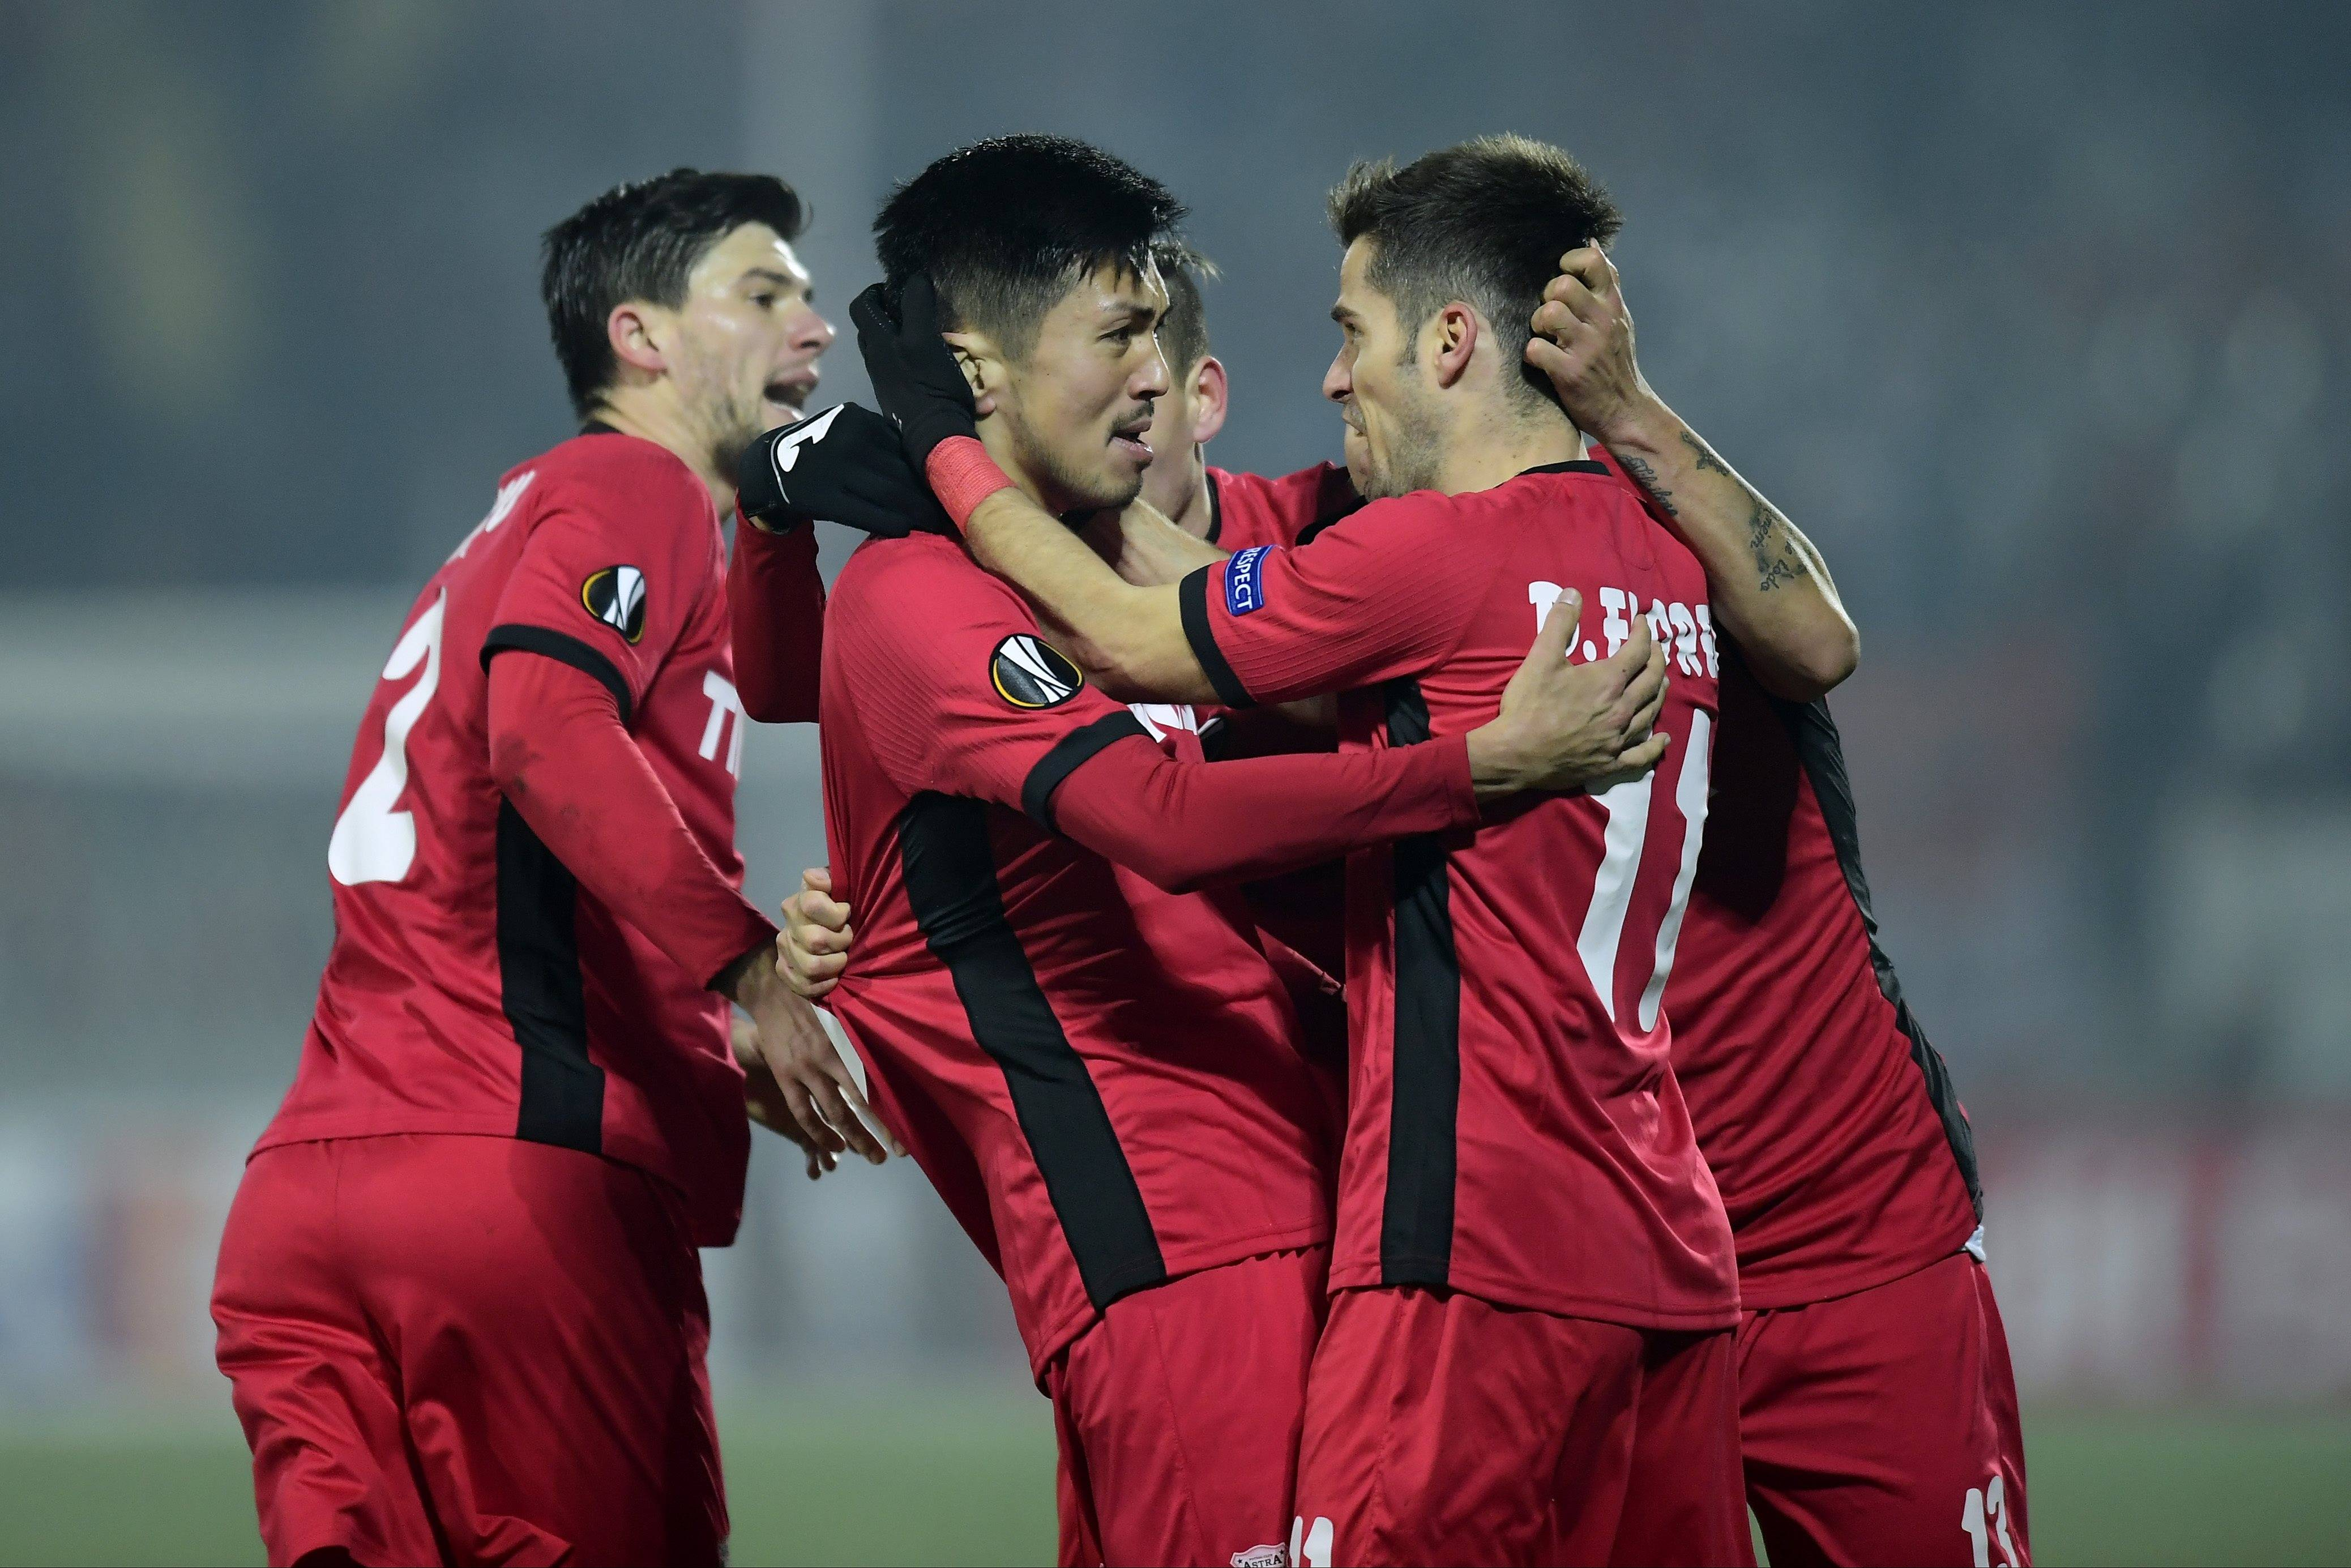 VIDEO: Takayuki Seto scores crucial goal for Astra in Europa League